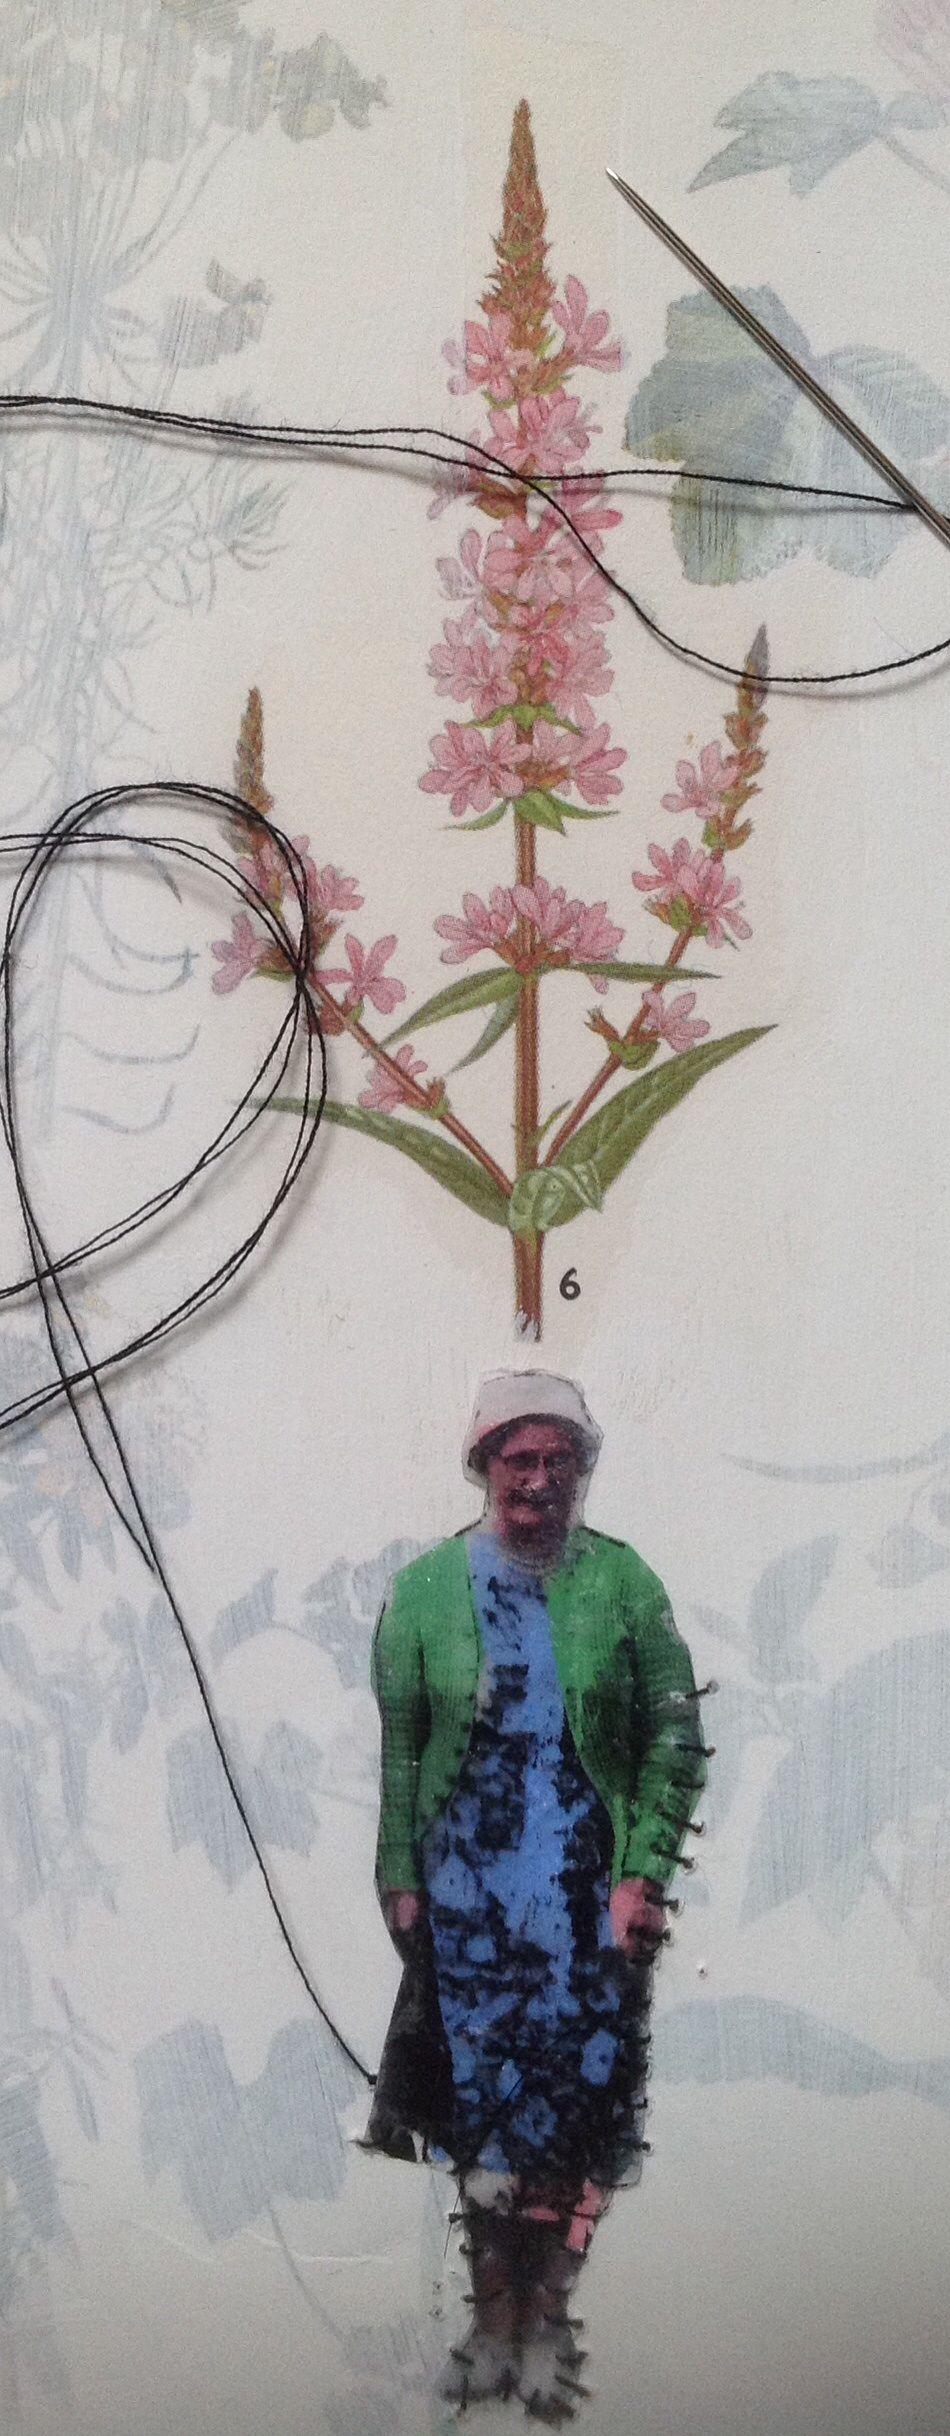 Stitching Nannas in my journal. Happy days! mrsbertimus.blogspot.com